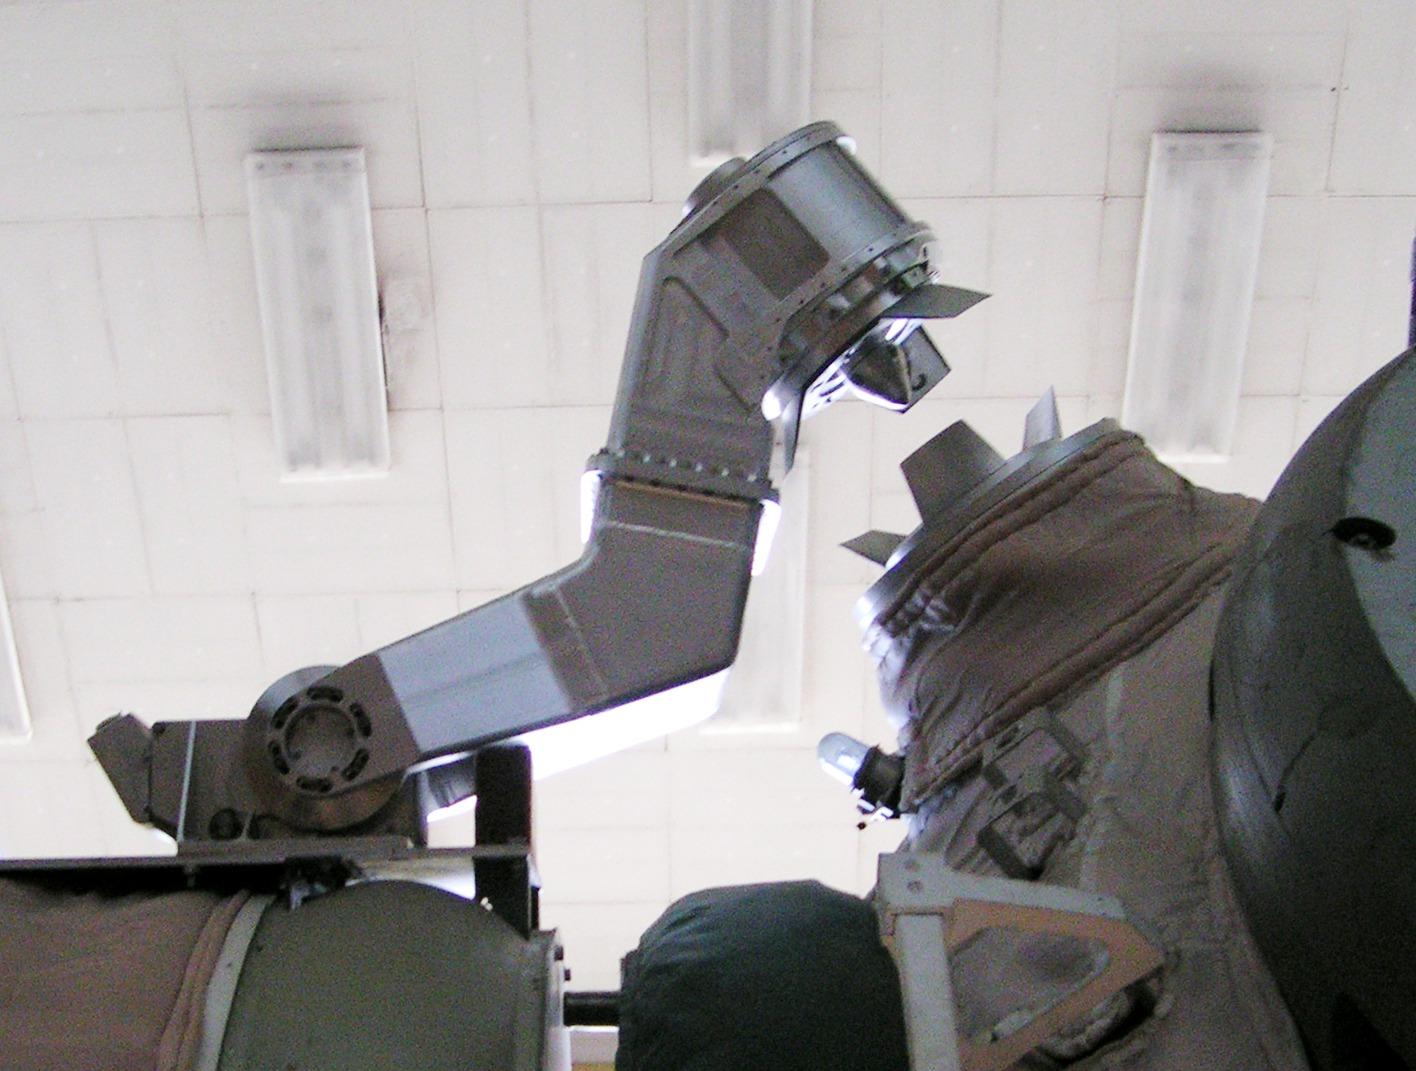 https://upload.wikimedia.org/wikipedia/commons/9/9a/Mir_arm2.JPG